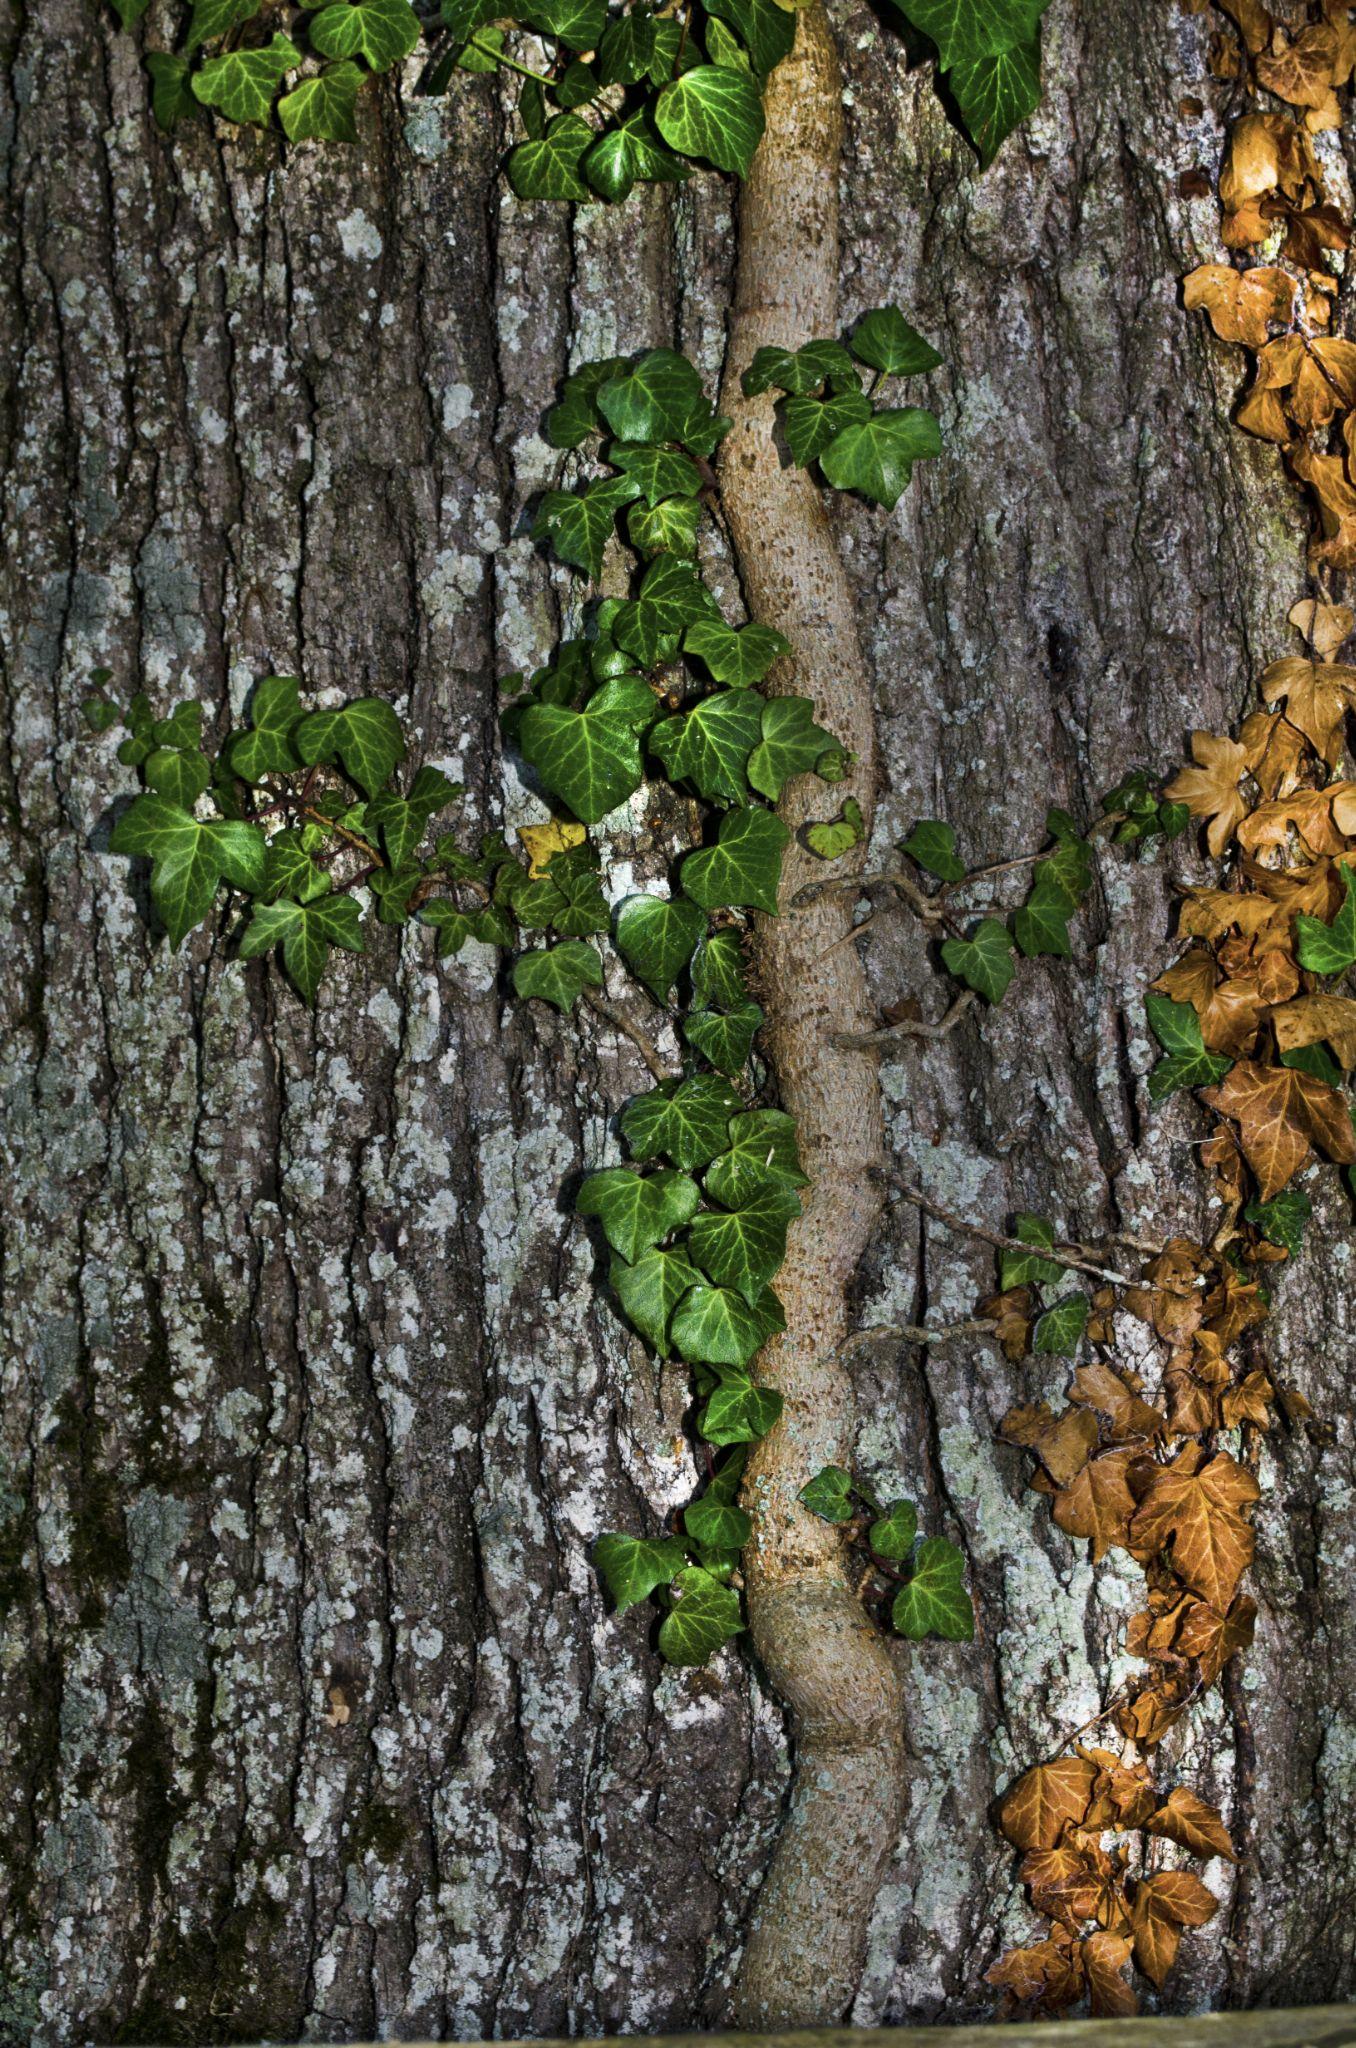 Tree Hugger by david.perry.5602